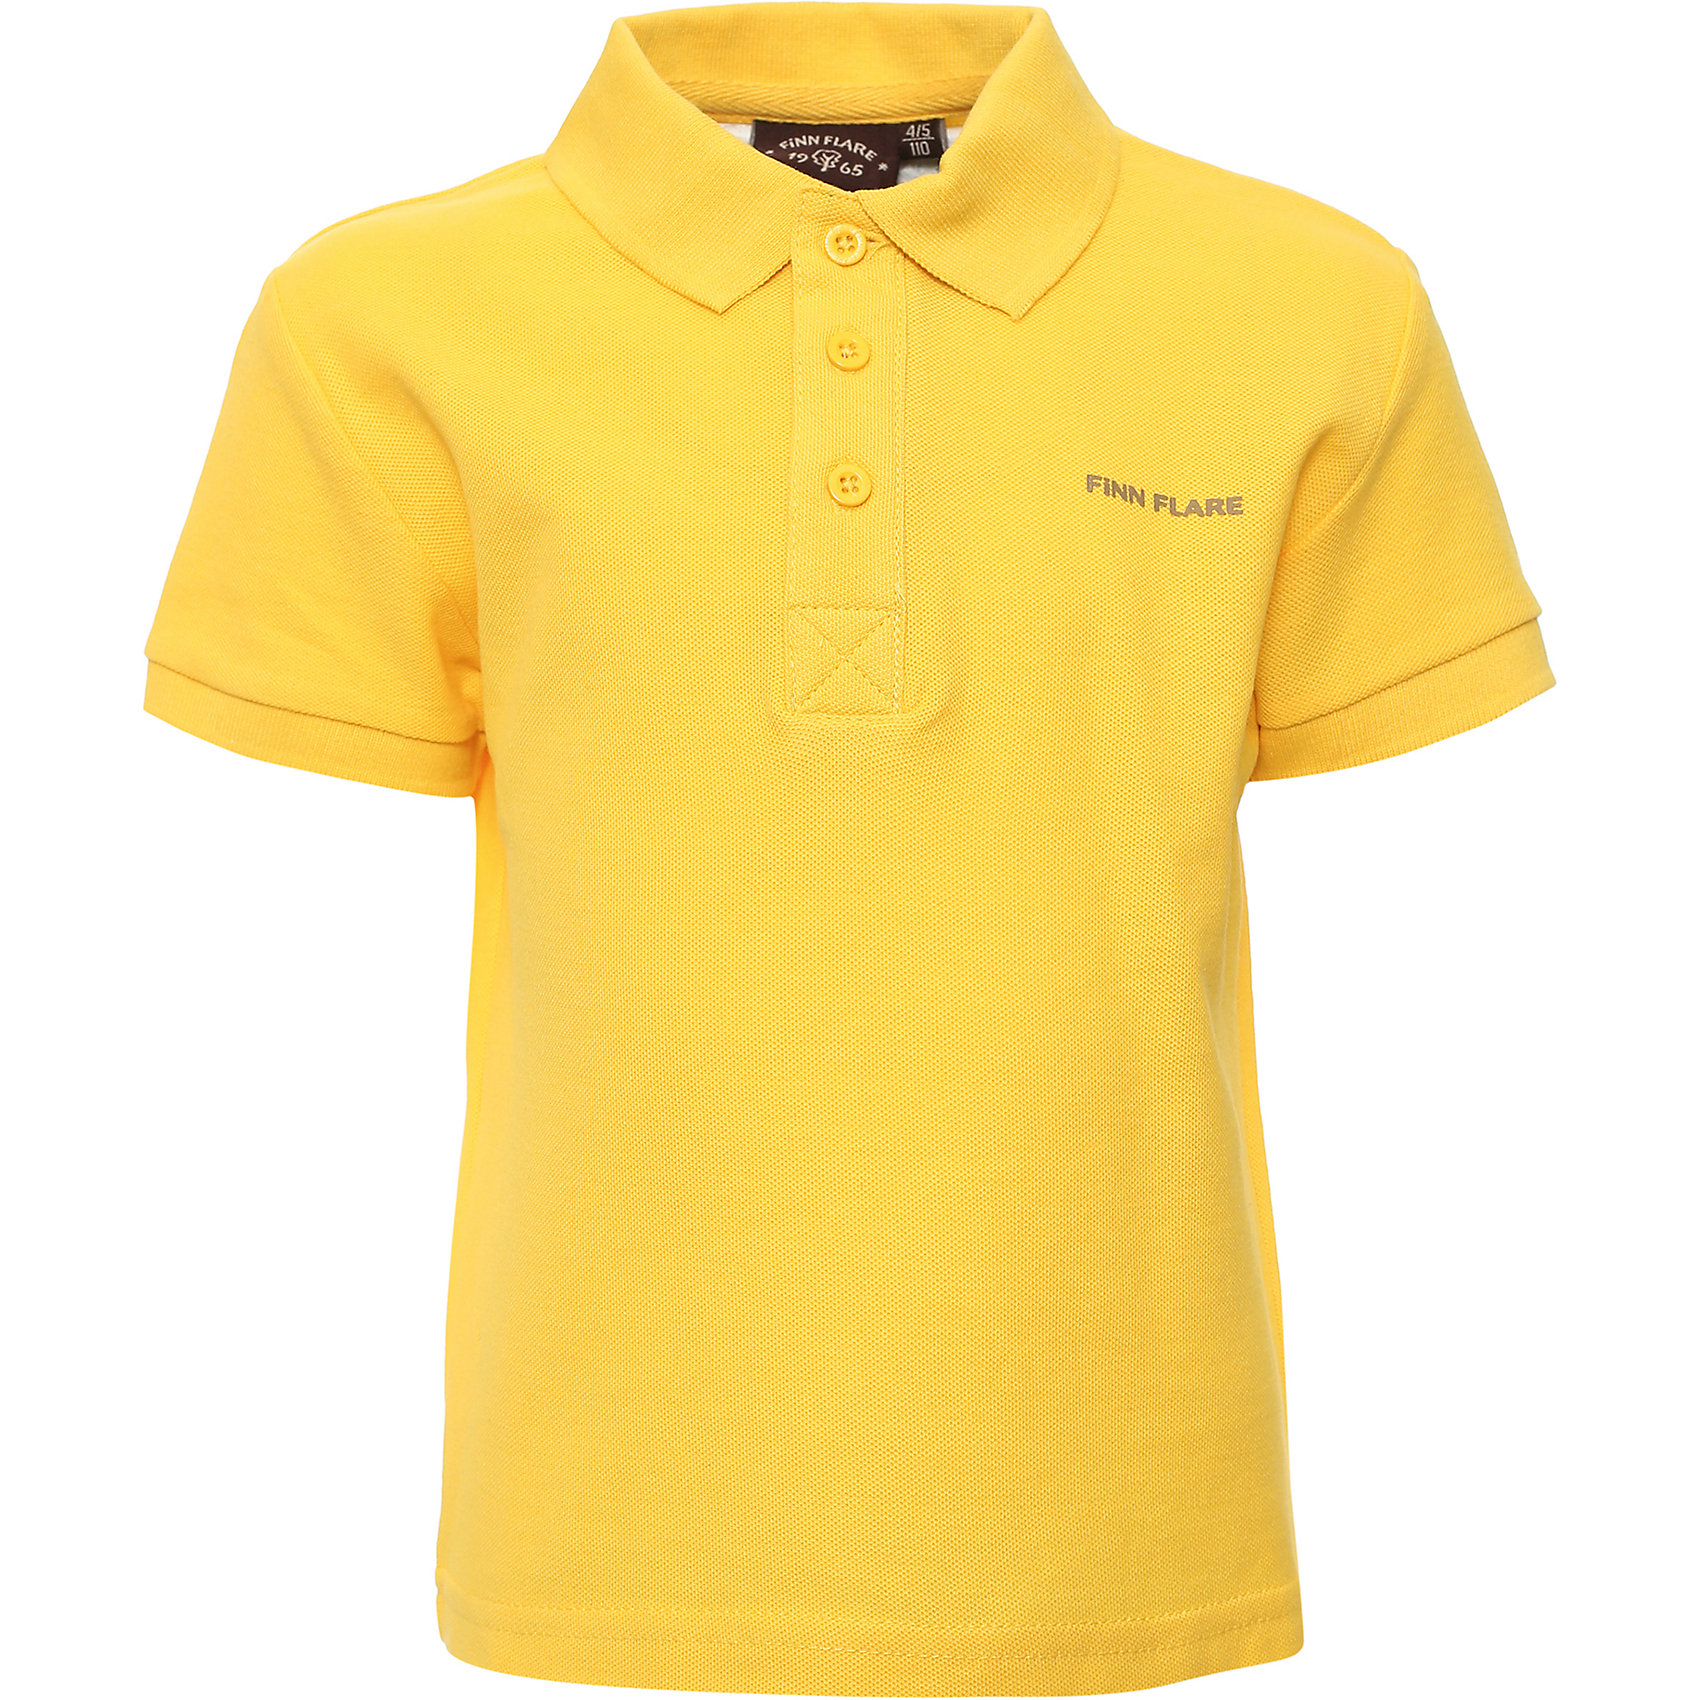 Рубашка для мальчика Finn FlareРубашка для мальчика от известного бренда Finn Flare<br>Фактура материала:Трикотажный<br>Вид застежки:Пуговицы<br> Длина рукава:Короткие<br> Тип карманов:Без карманов<br>Состав:<br>100% хлопок<br><br>Ширина мм: 174<br>Глубина мм: 10<br>Высота мм: 169<br>Вес г: 157<br>Цвет: желтый<br>Возраст от месяцев: 48<br>Возраст до месяцев: 60<br>Пол: Мужской<br>Возраст: Детский<br>Размер: 110,122<br>SKU: 4835894